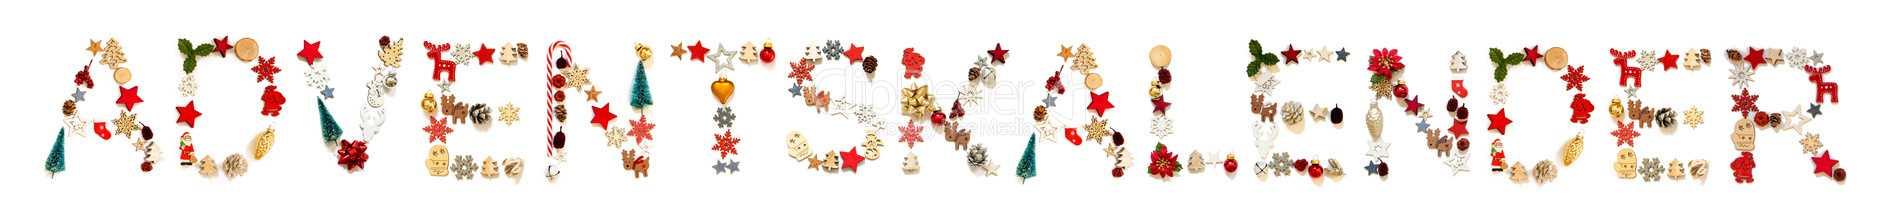 Christmas Decoration Letter Building Adventskalender Means Advent Calendar